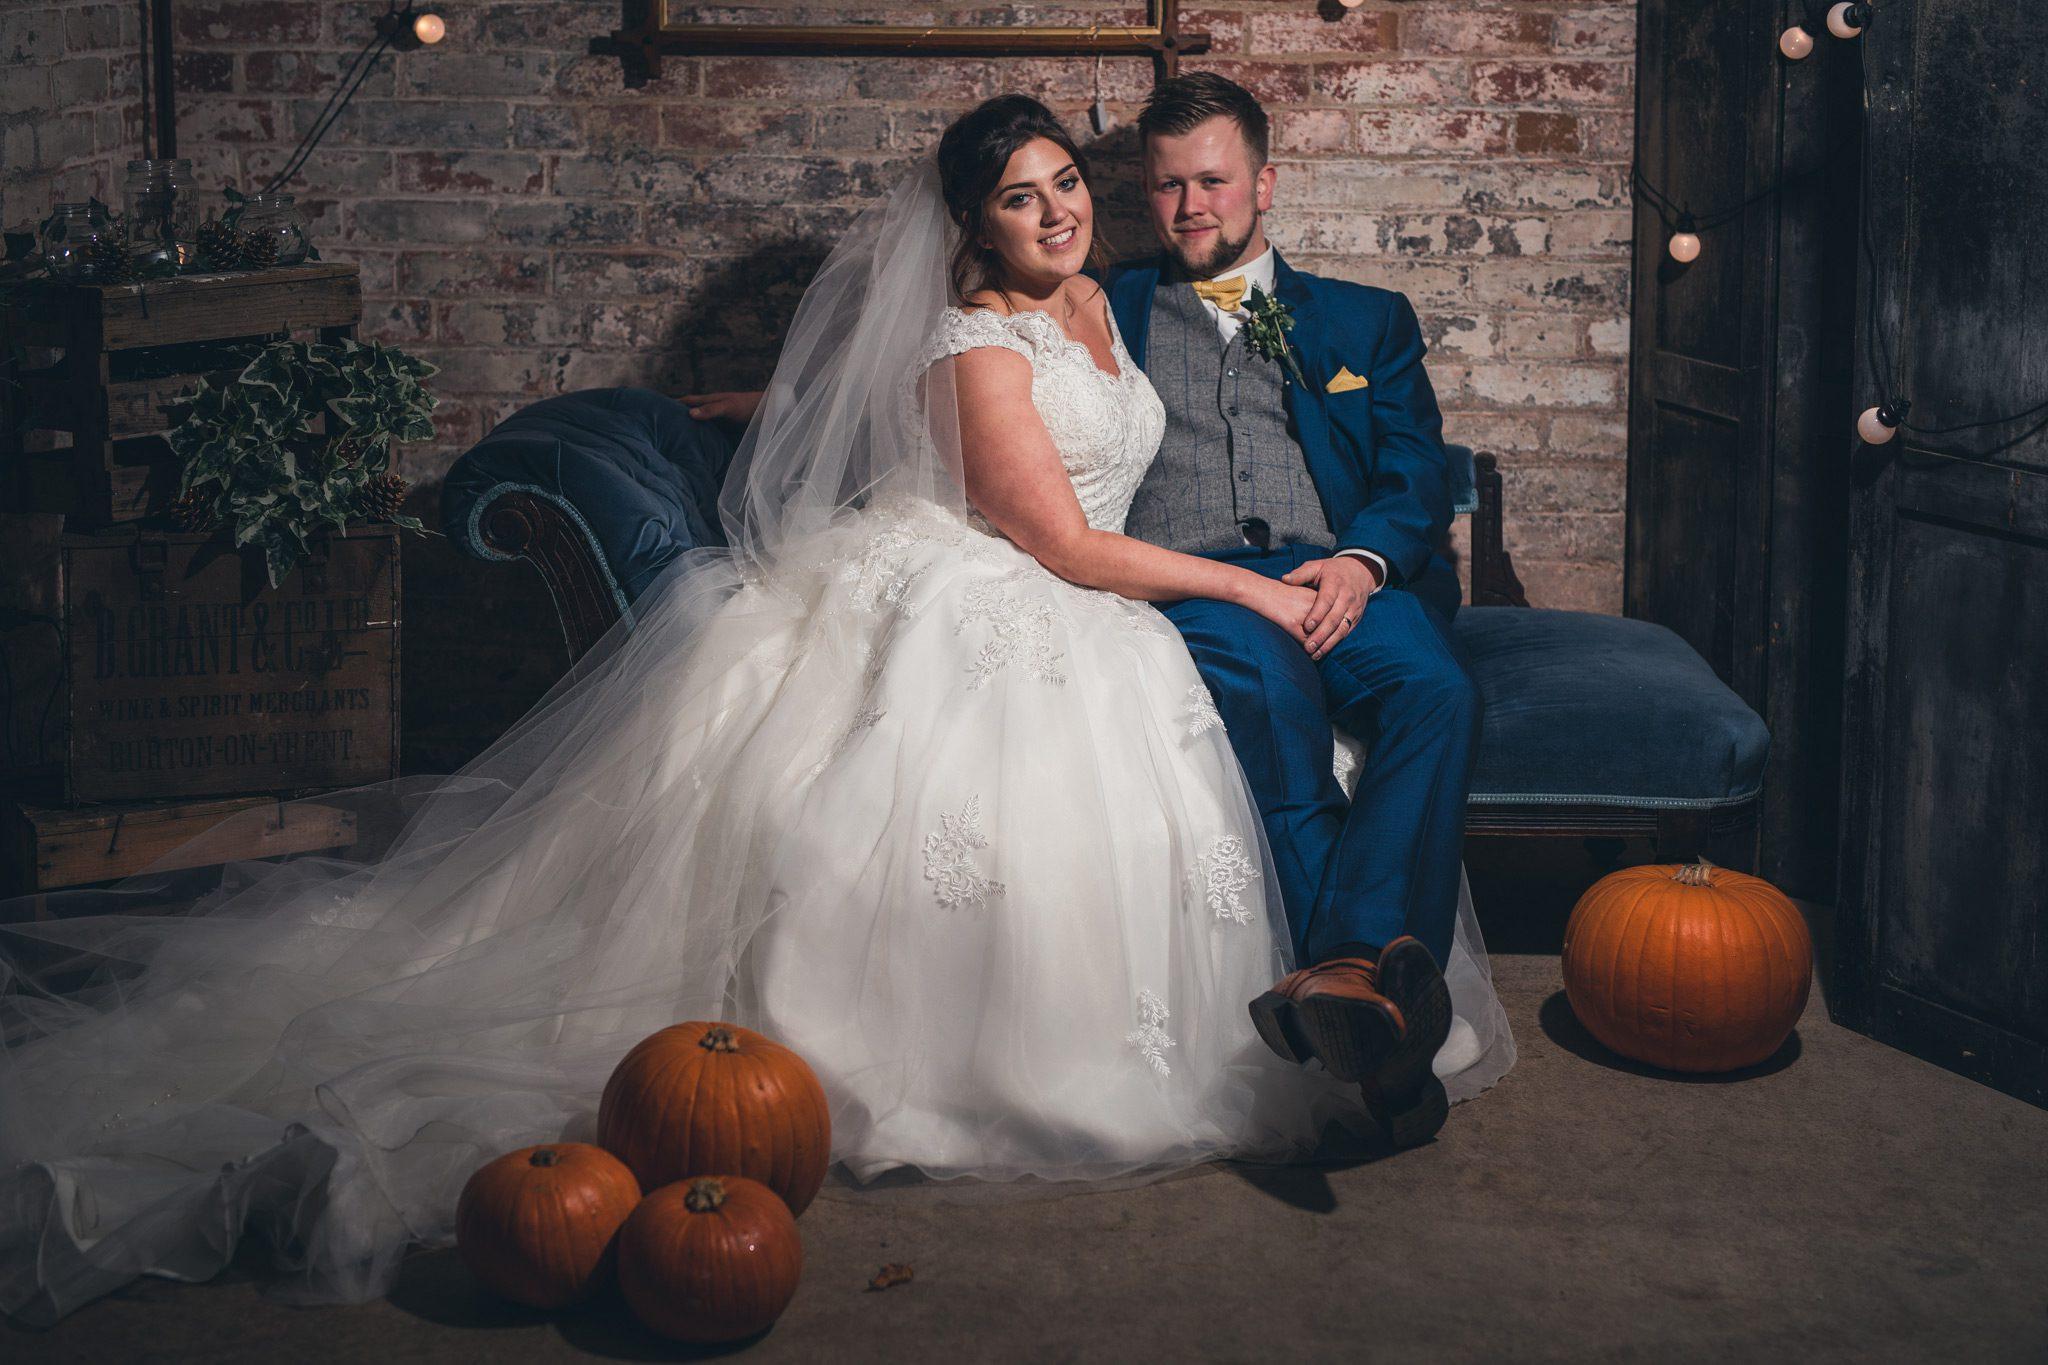 Couple with pumpkins at Yeldersley Hall